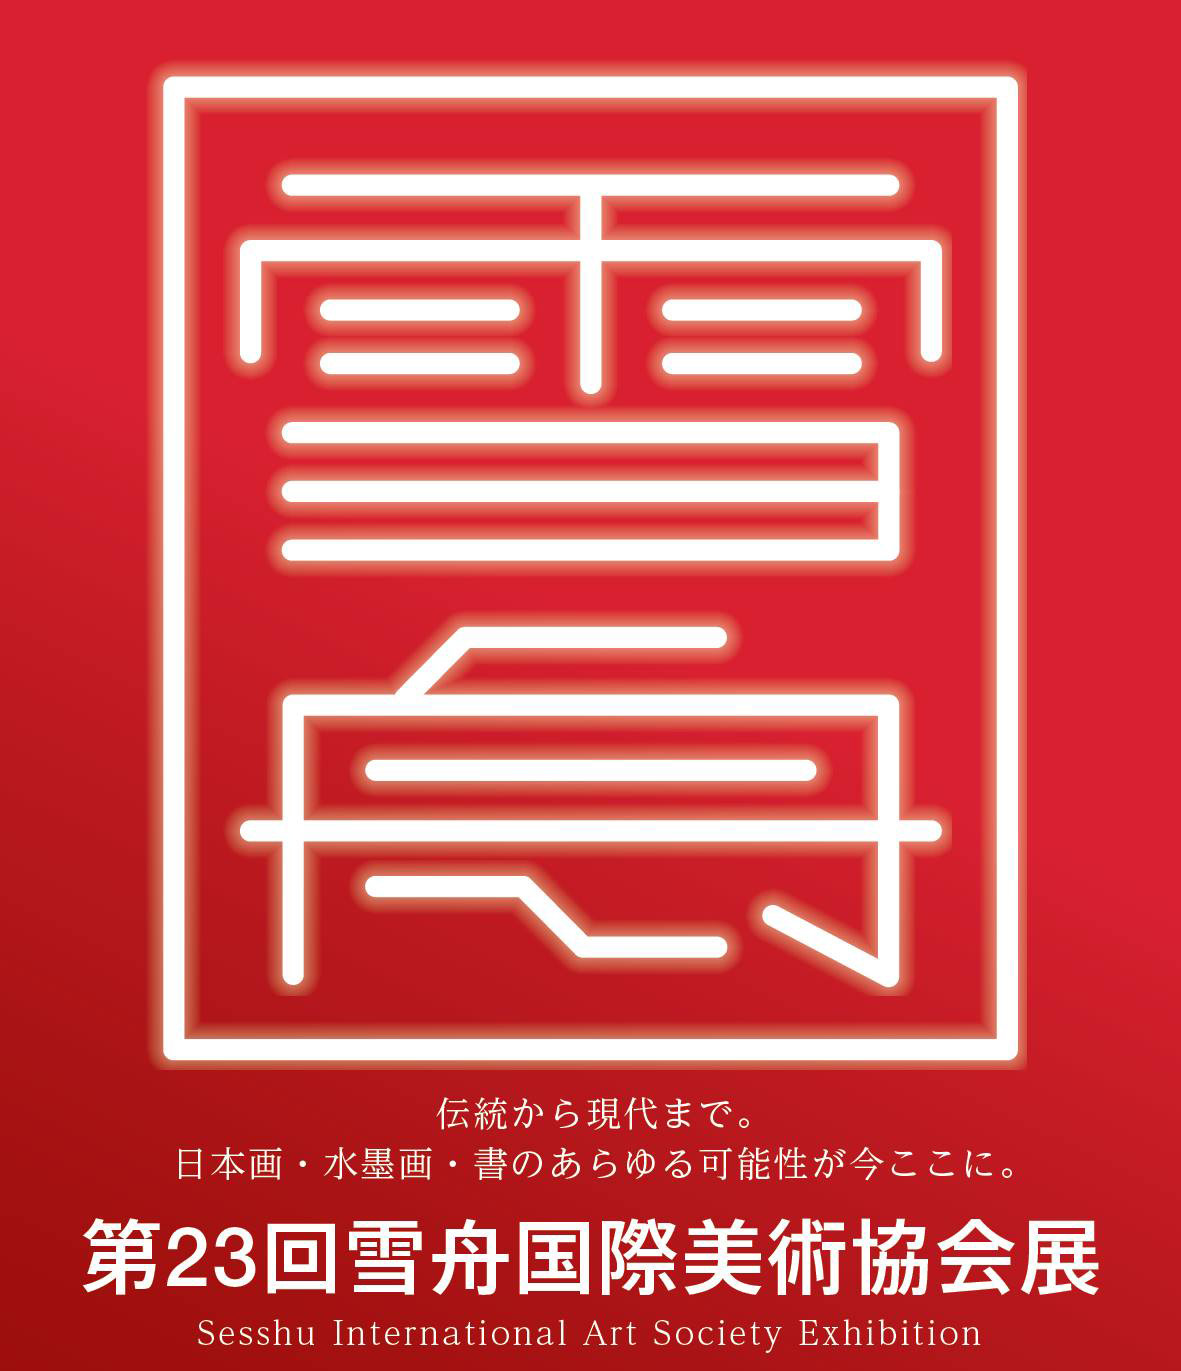 第23回雪舟国際美術協会展ポスター